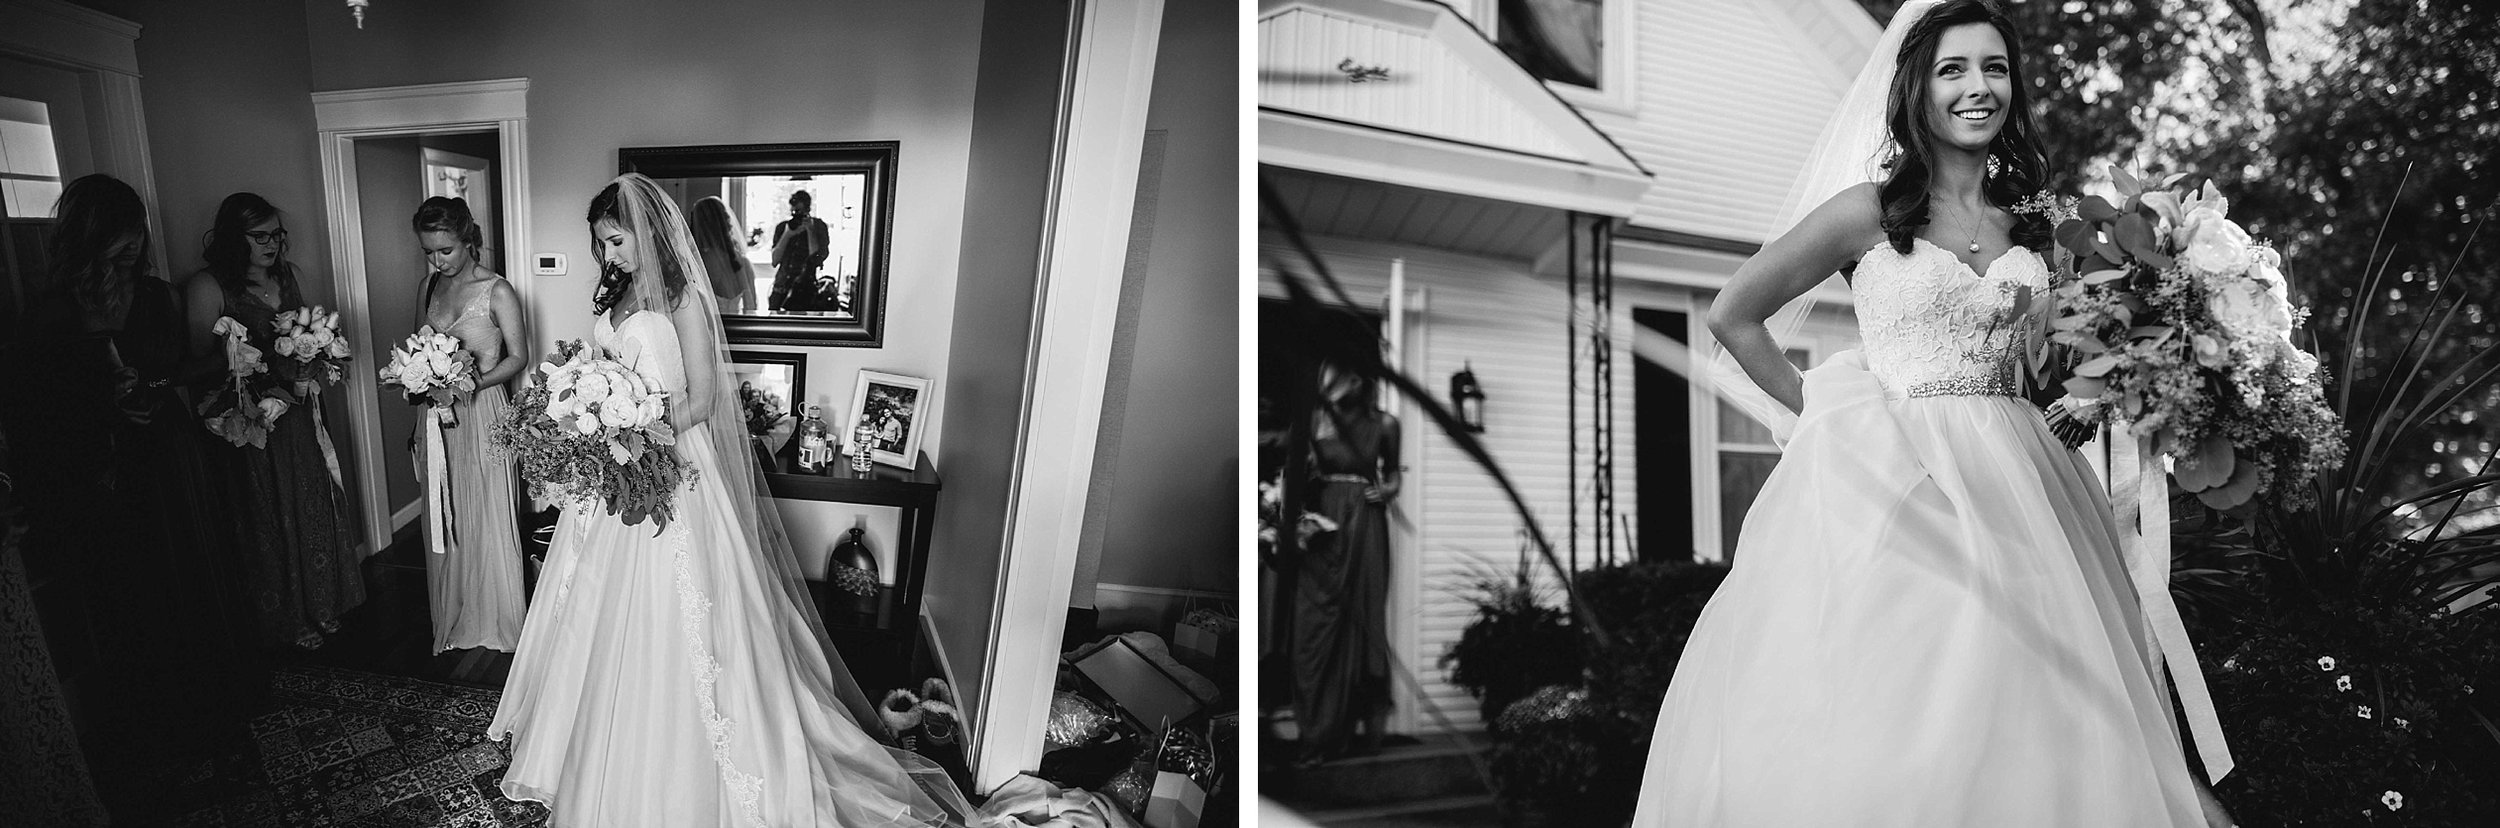 Providence-RI-Wedding-8.jpg